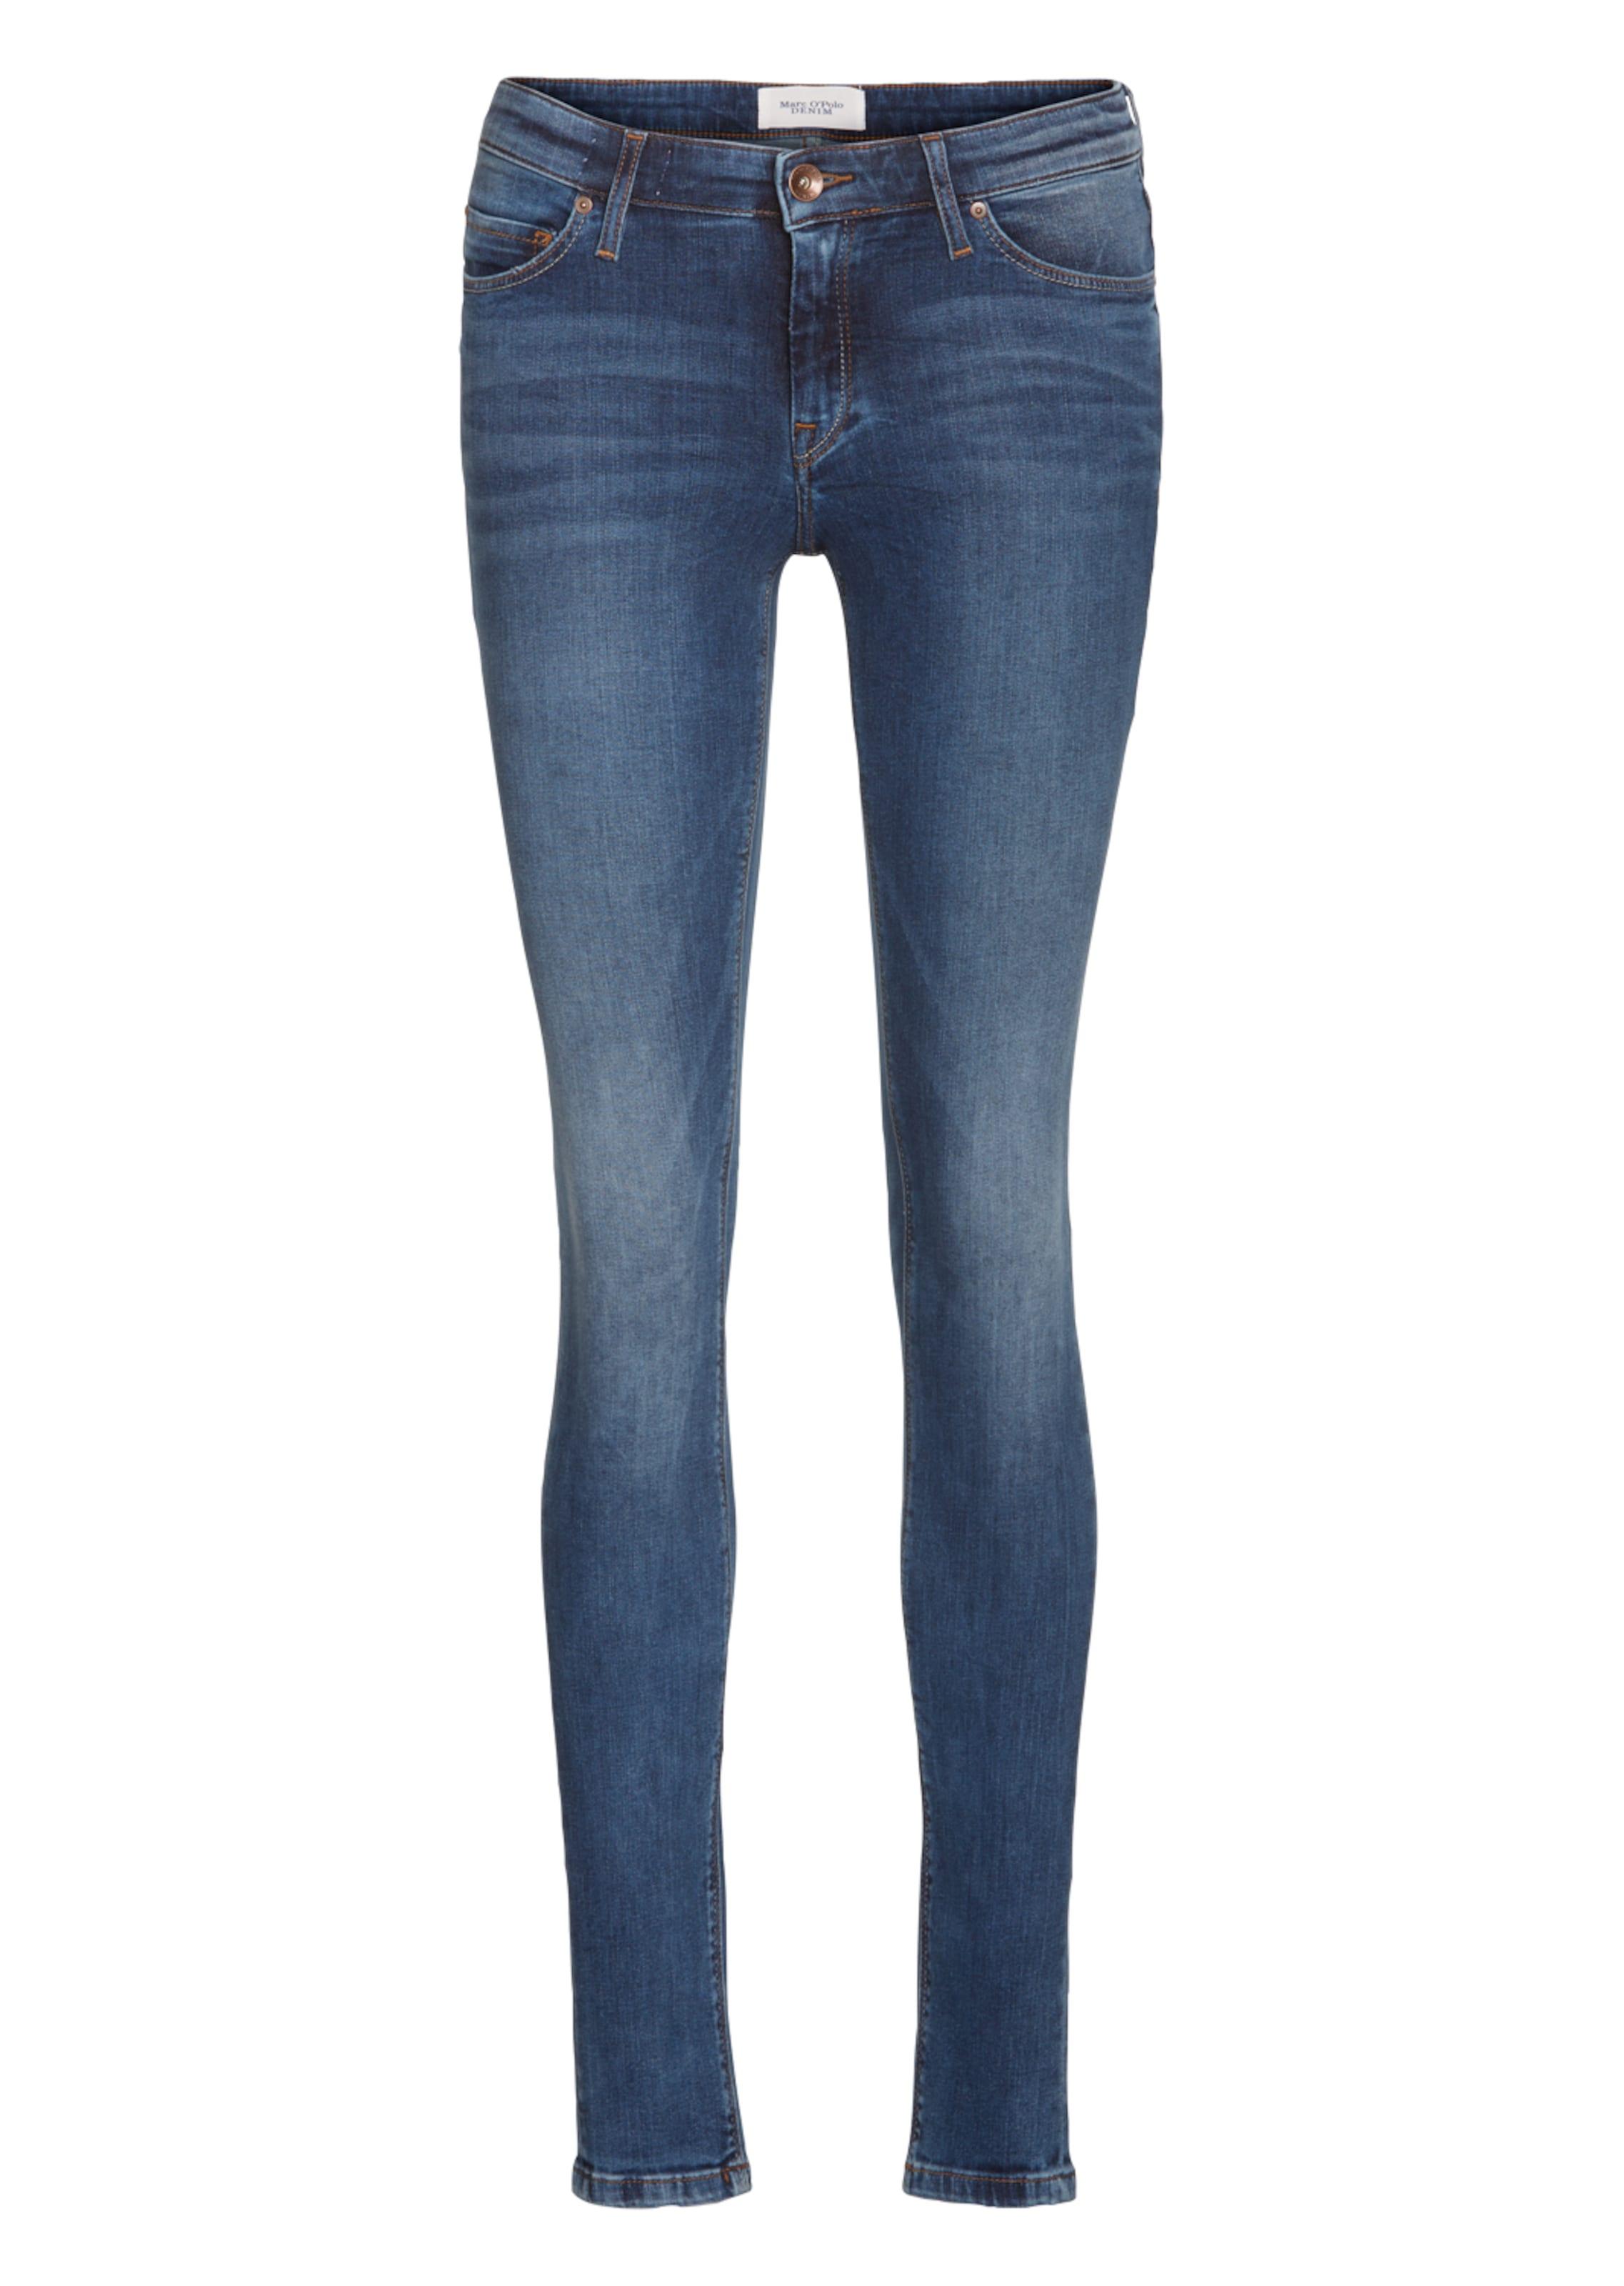 O'polo In Marc Jeans 'siv' Denim Blue 08nOPwk